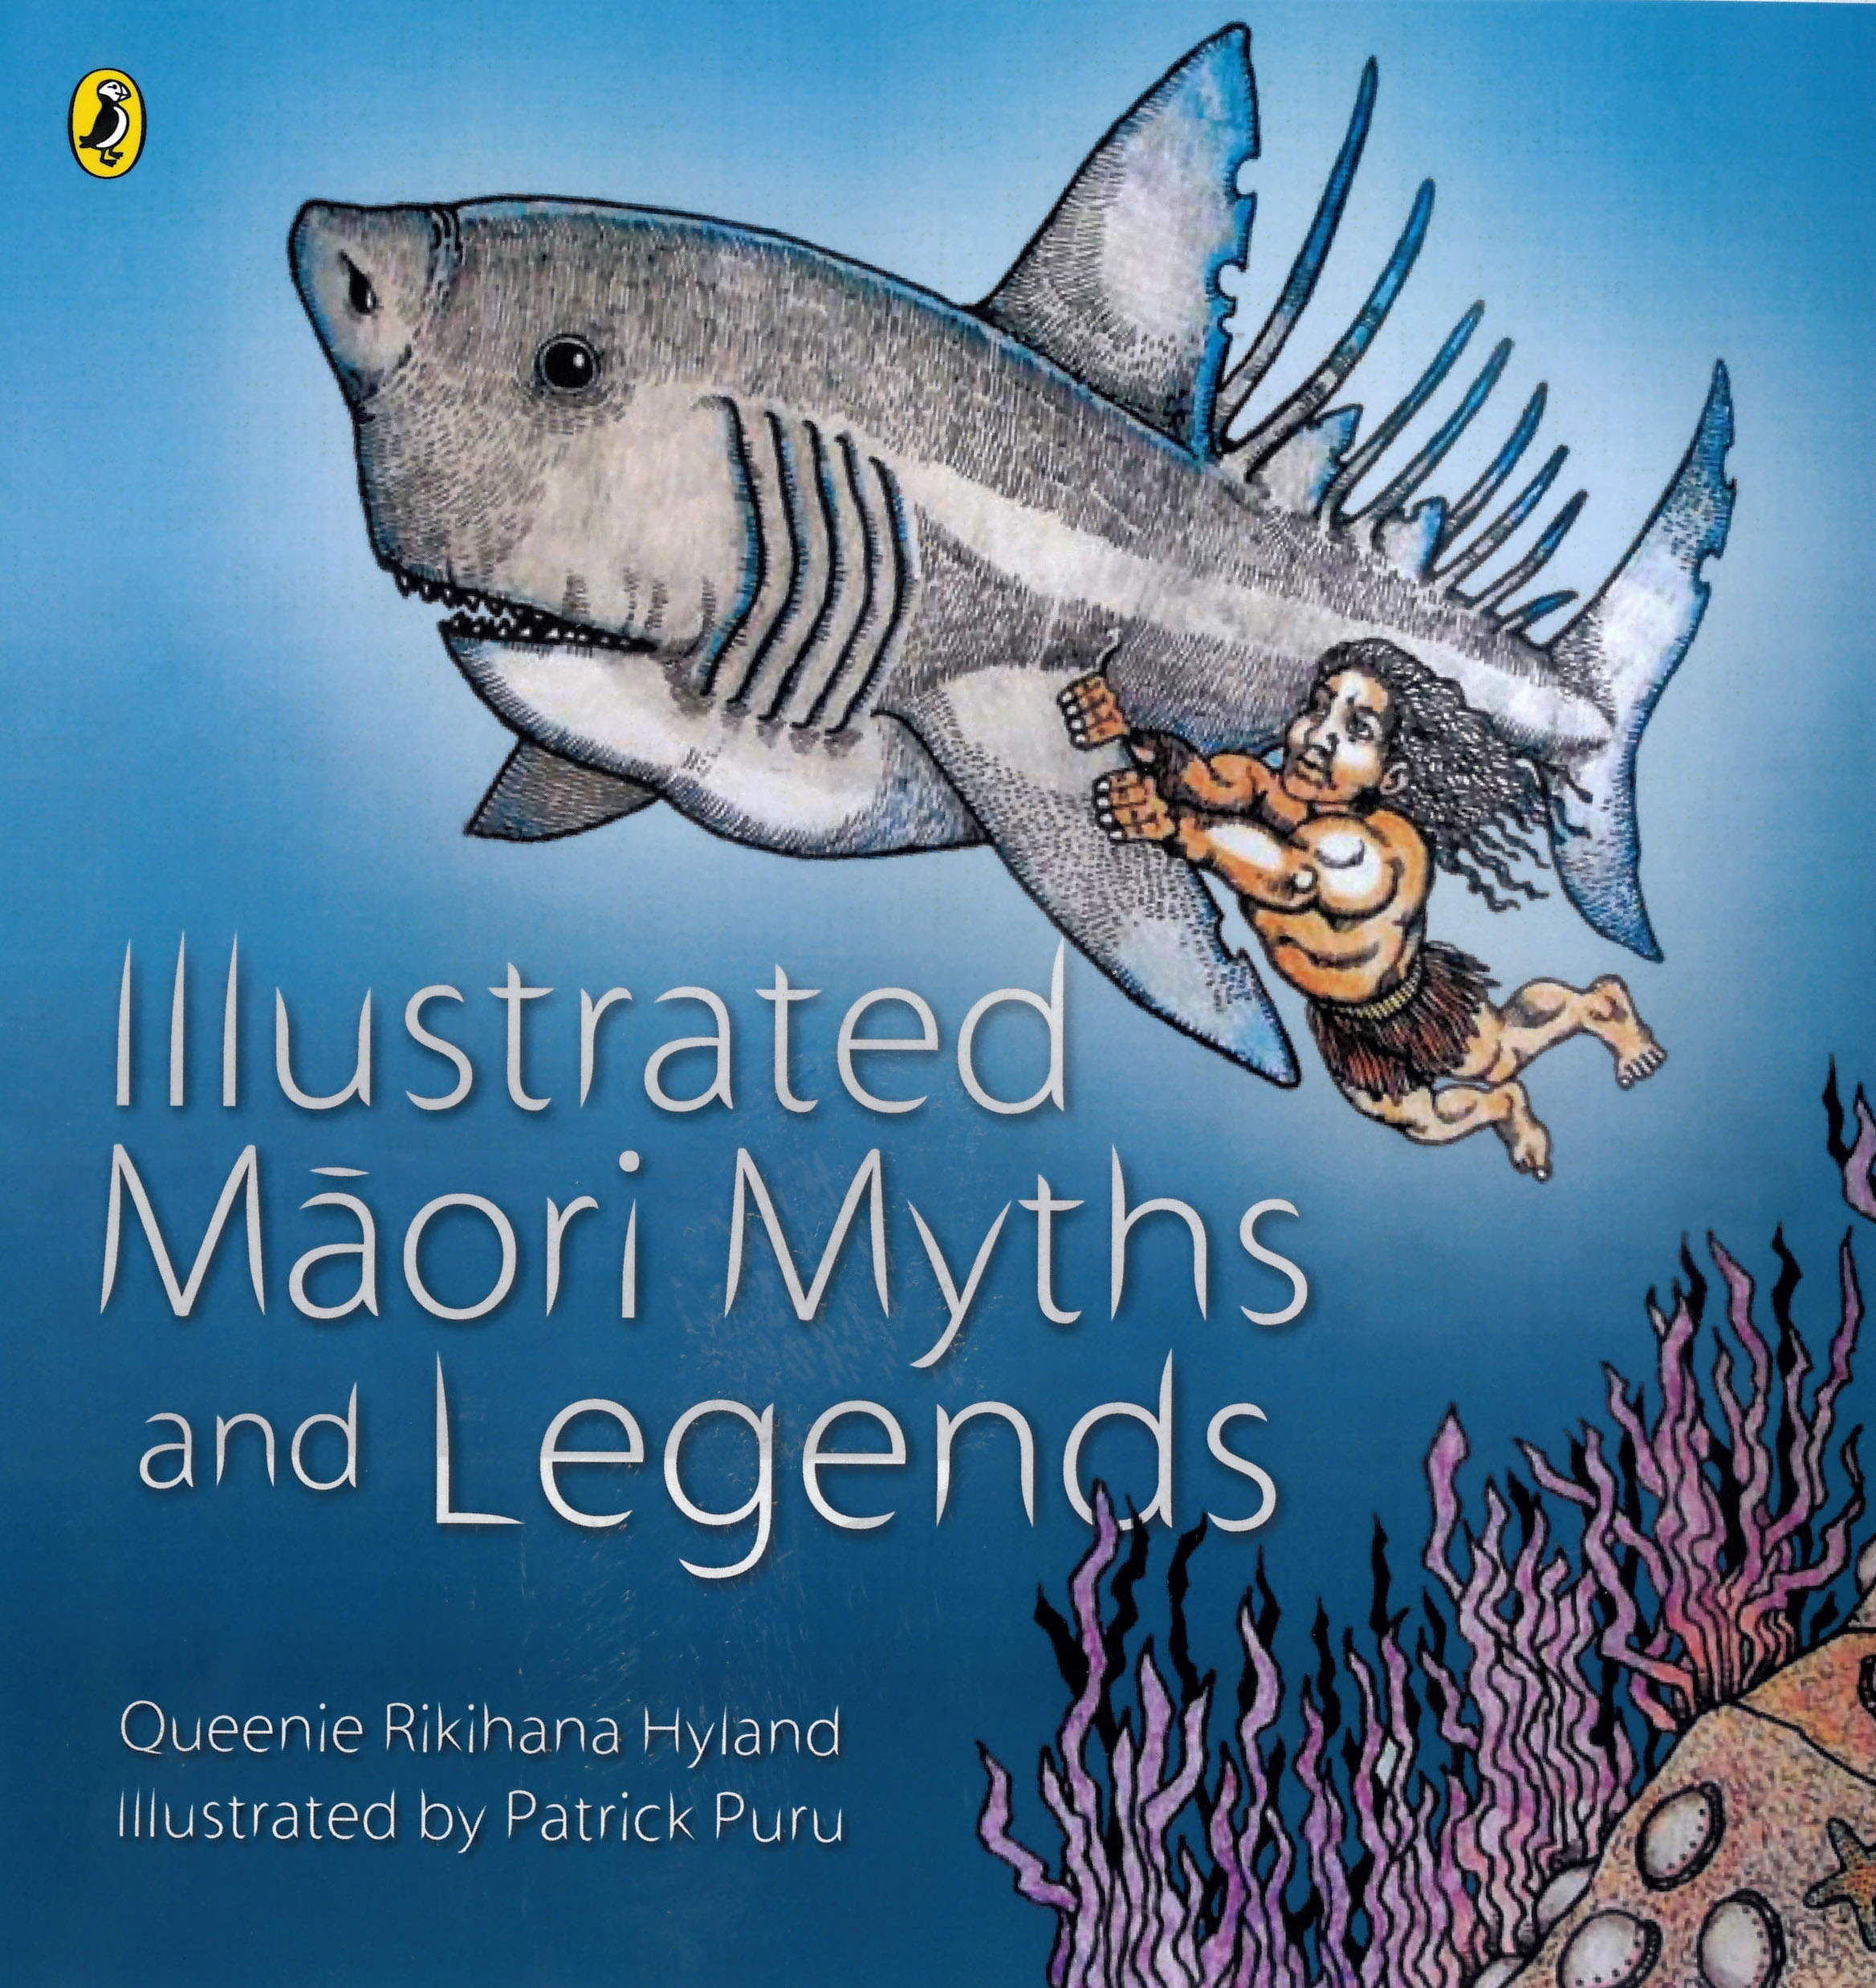 Maori Mythology: Illustrated Maori Myths And Legends By Queenie Rikihana